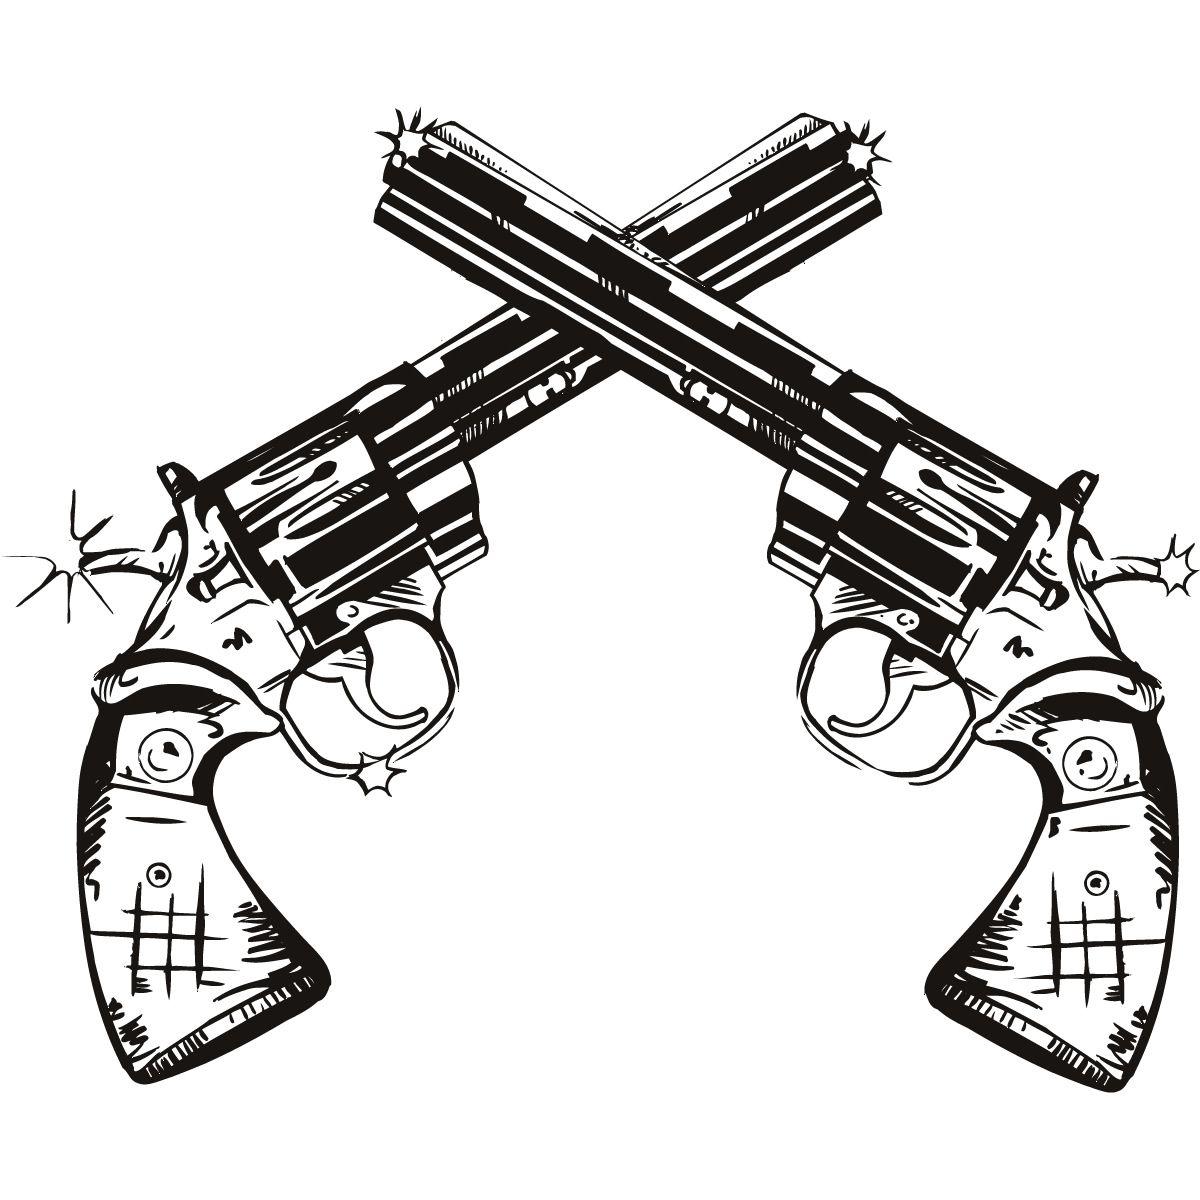 Line Art Gun : Gun drawings twin pistols wall art stickers